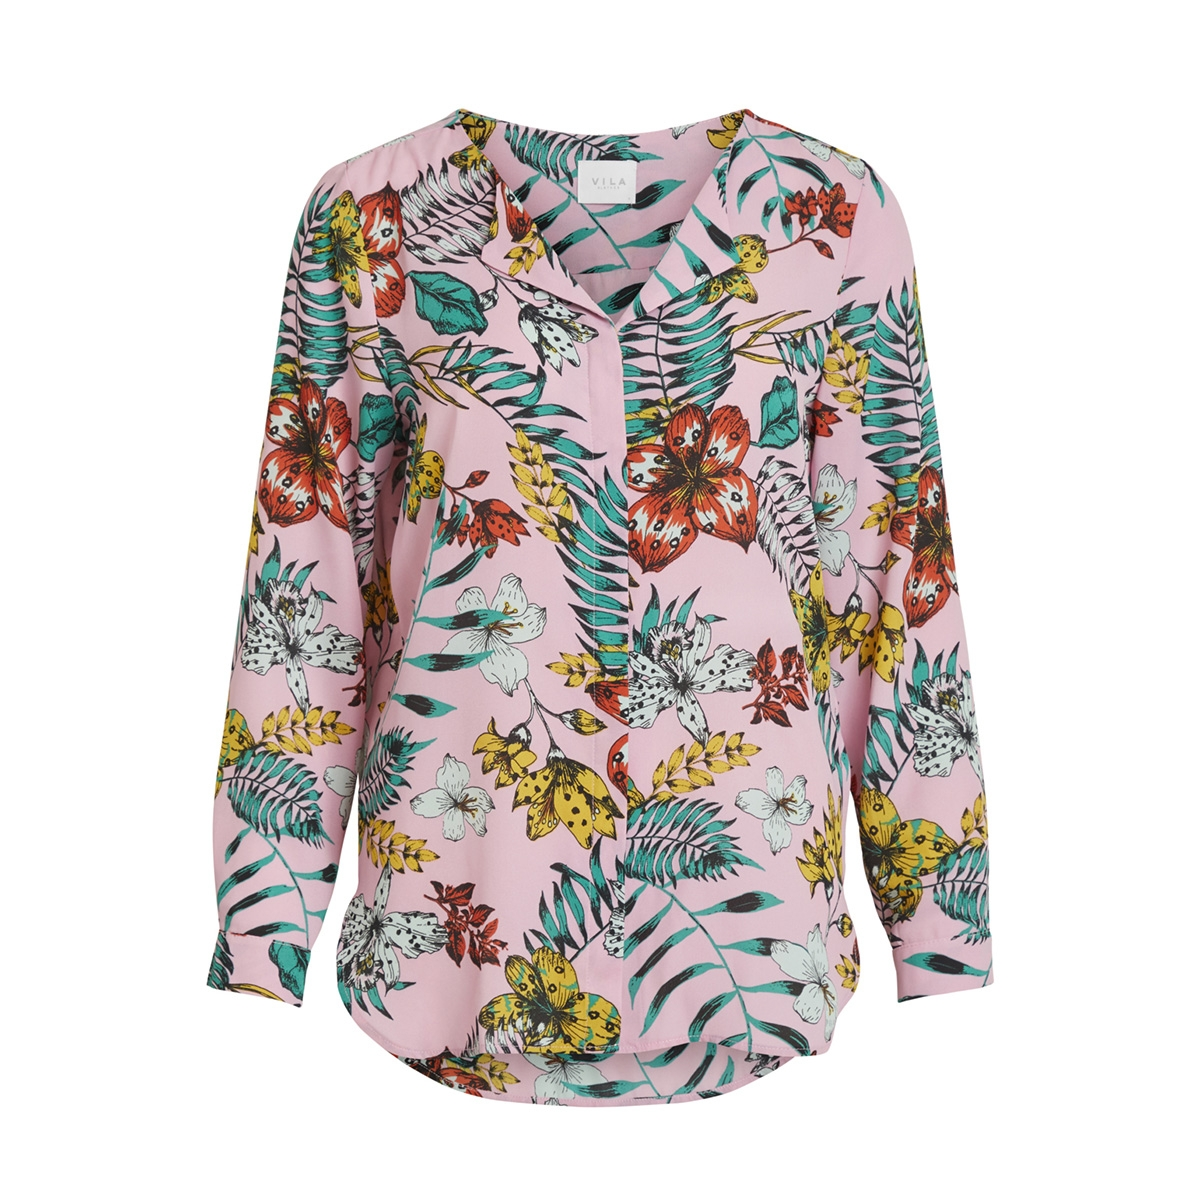 vilucy l/s shirt - fav lux 14049450 vila blouse begonia pink/monaria